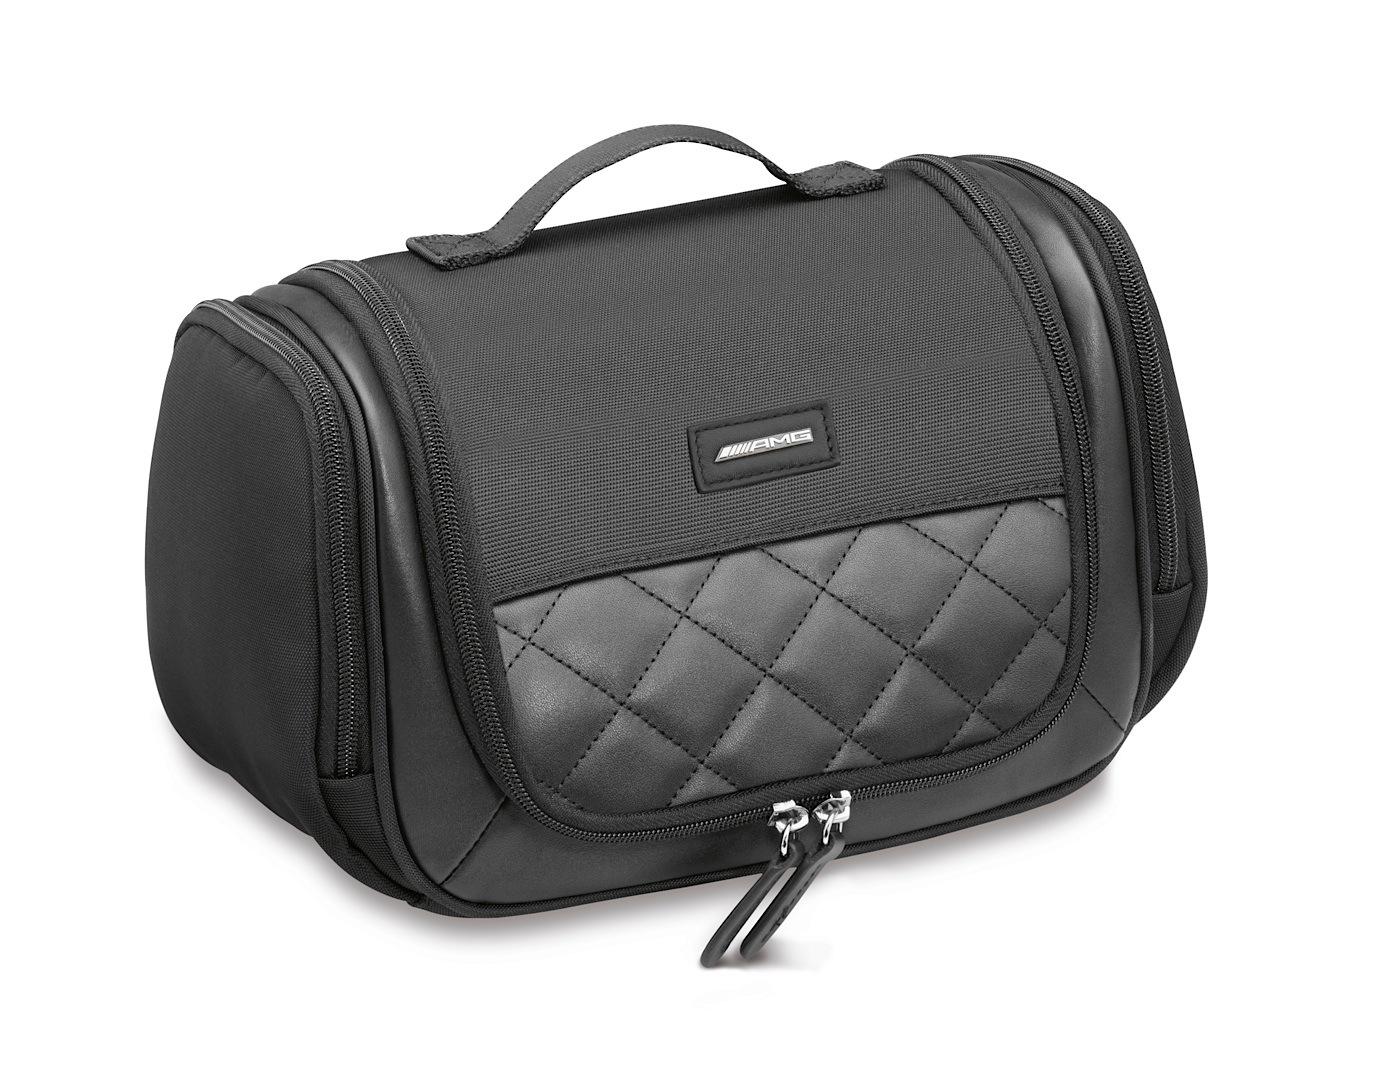 Mercedes Benz Accessories Handbags Best Handbag 2018